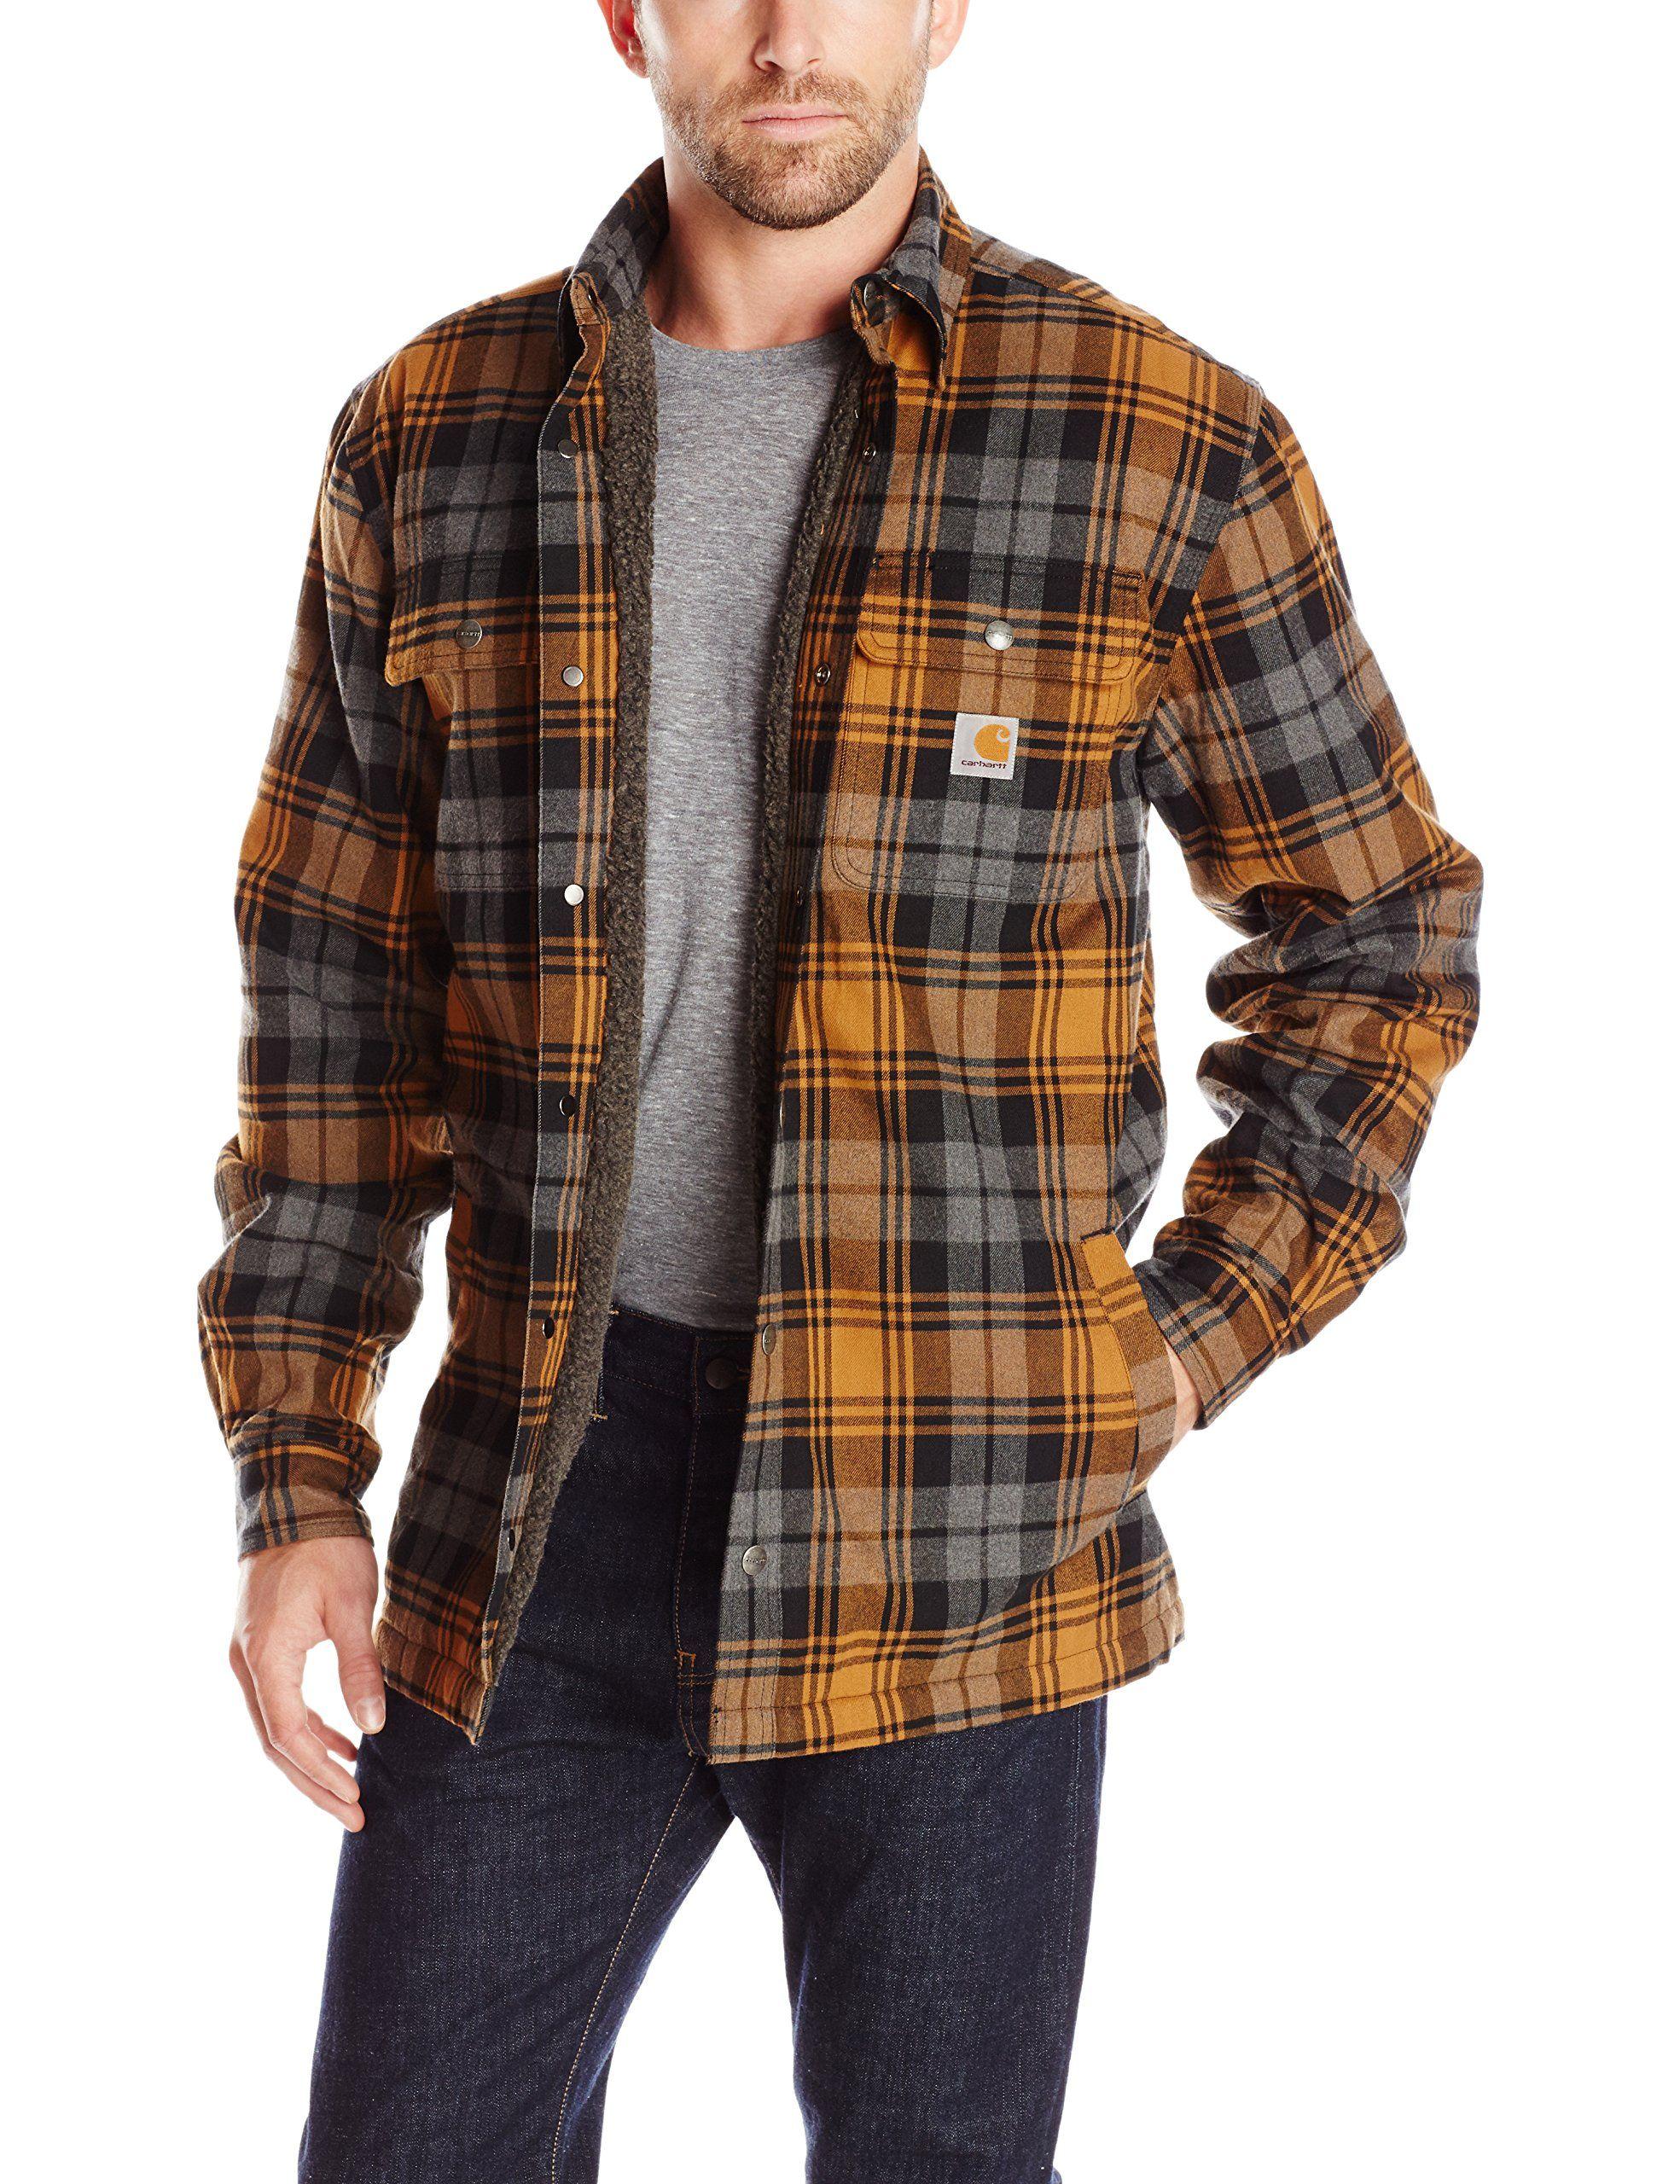 f107150b9cce2d Carhartt Men's Hubbard Sherpa Lined Shirt Jacket, Carhartt Brown, Large